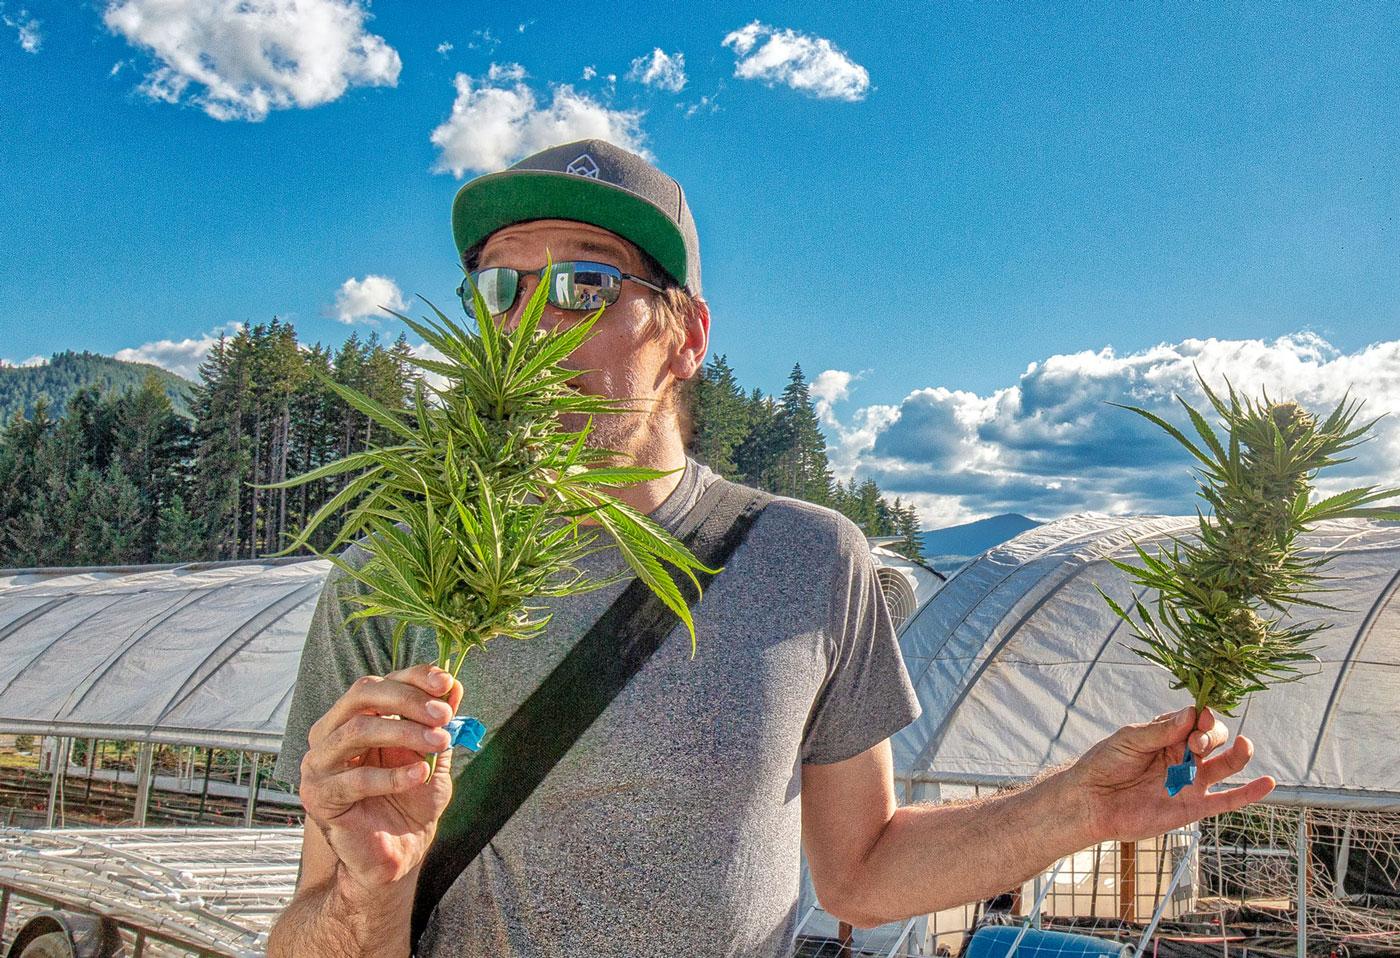 Ryan Michael shooting photography on a cannabis farm